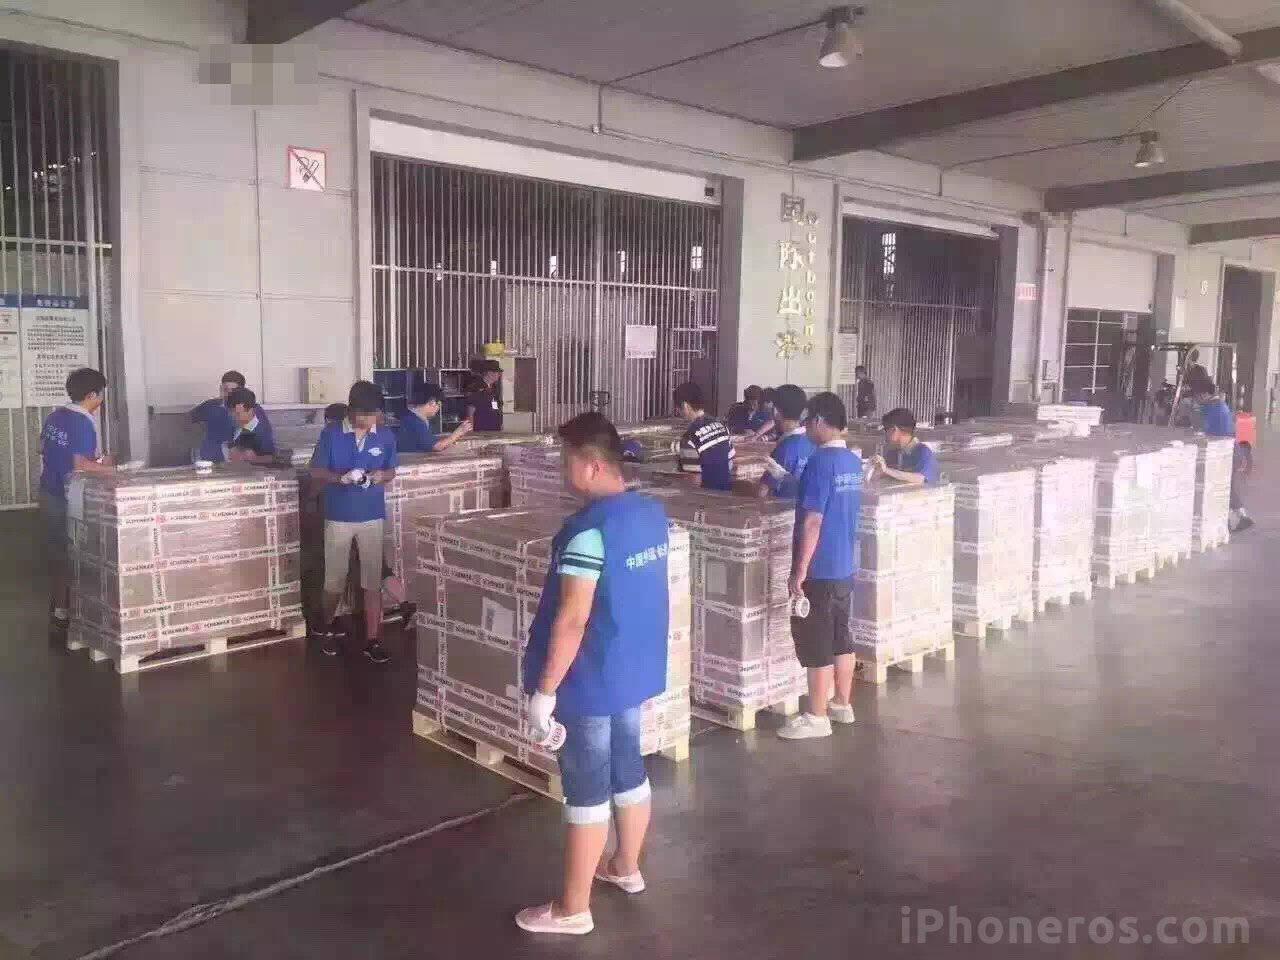 iPhone 7 saliendo de la fábrica de Foxconn